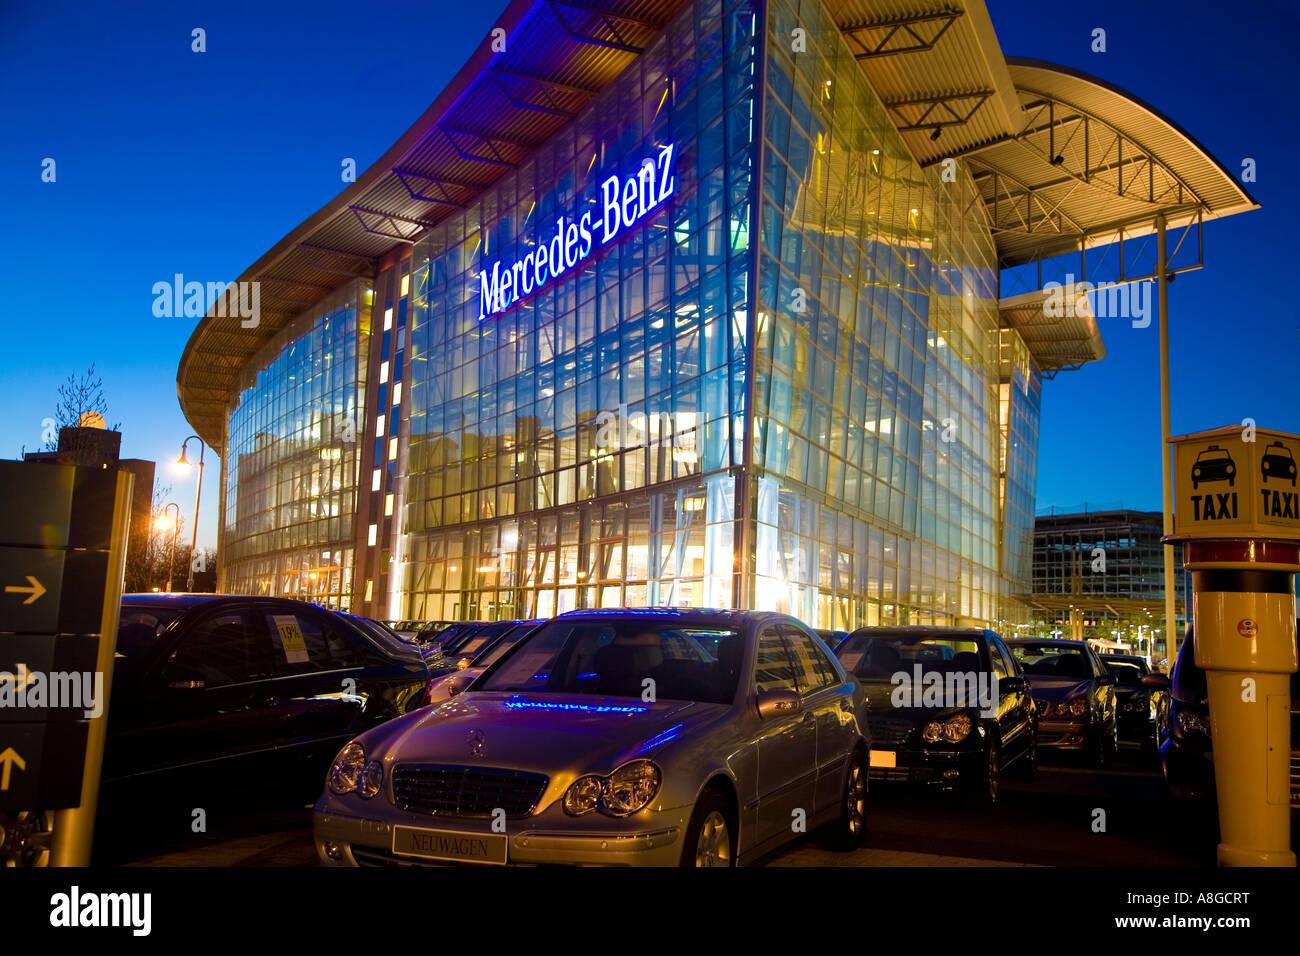 mercedes dealership berlin stockfotos & mercedes dealership berlin